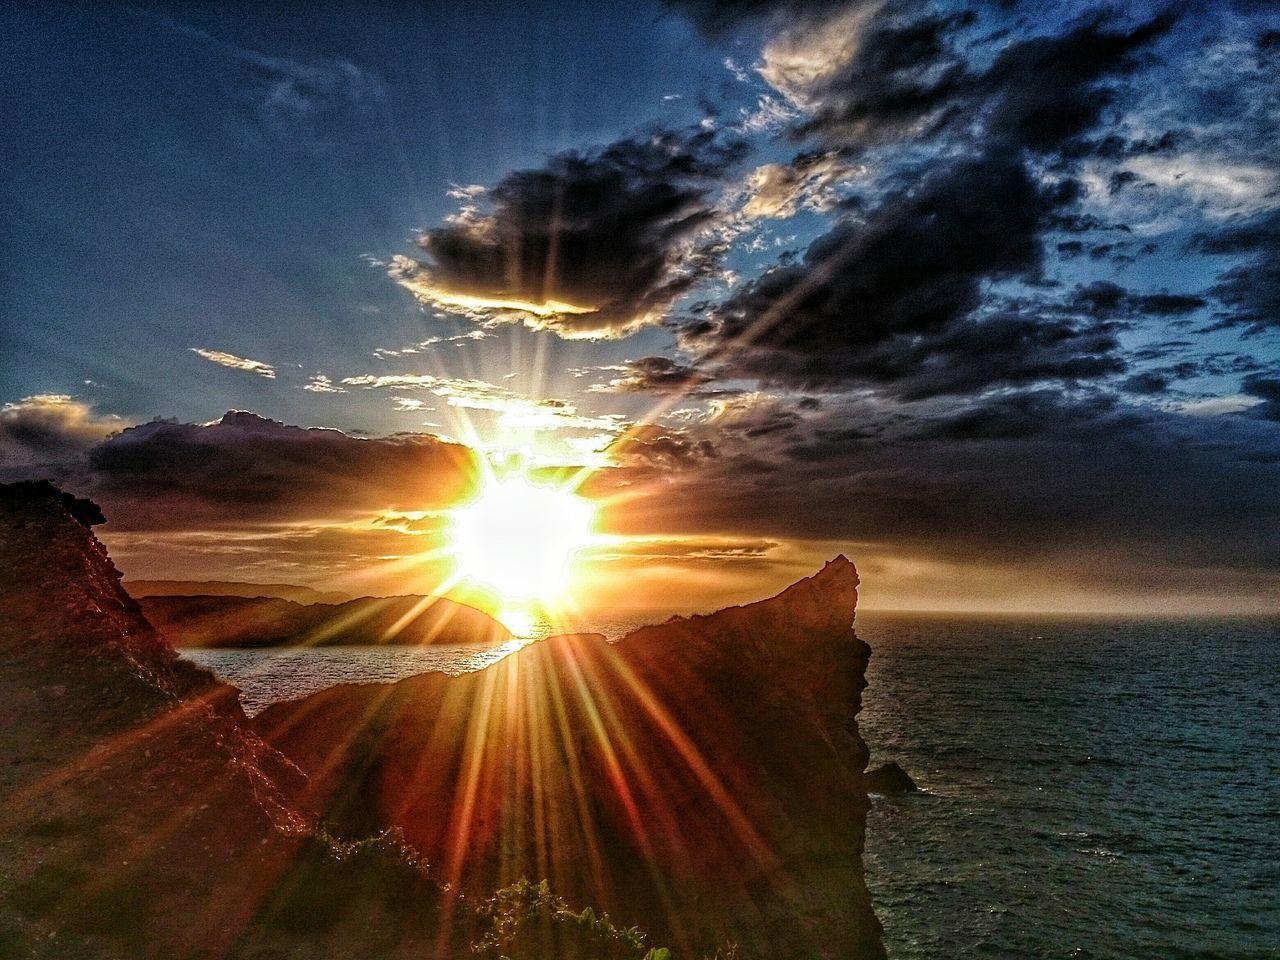 Sunset Tranquil Scene Sunlight Beauty In Nature